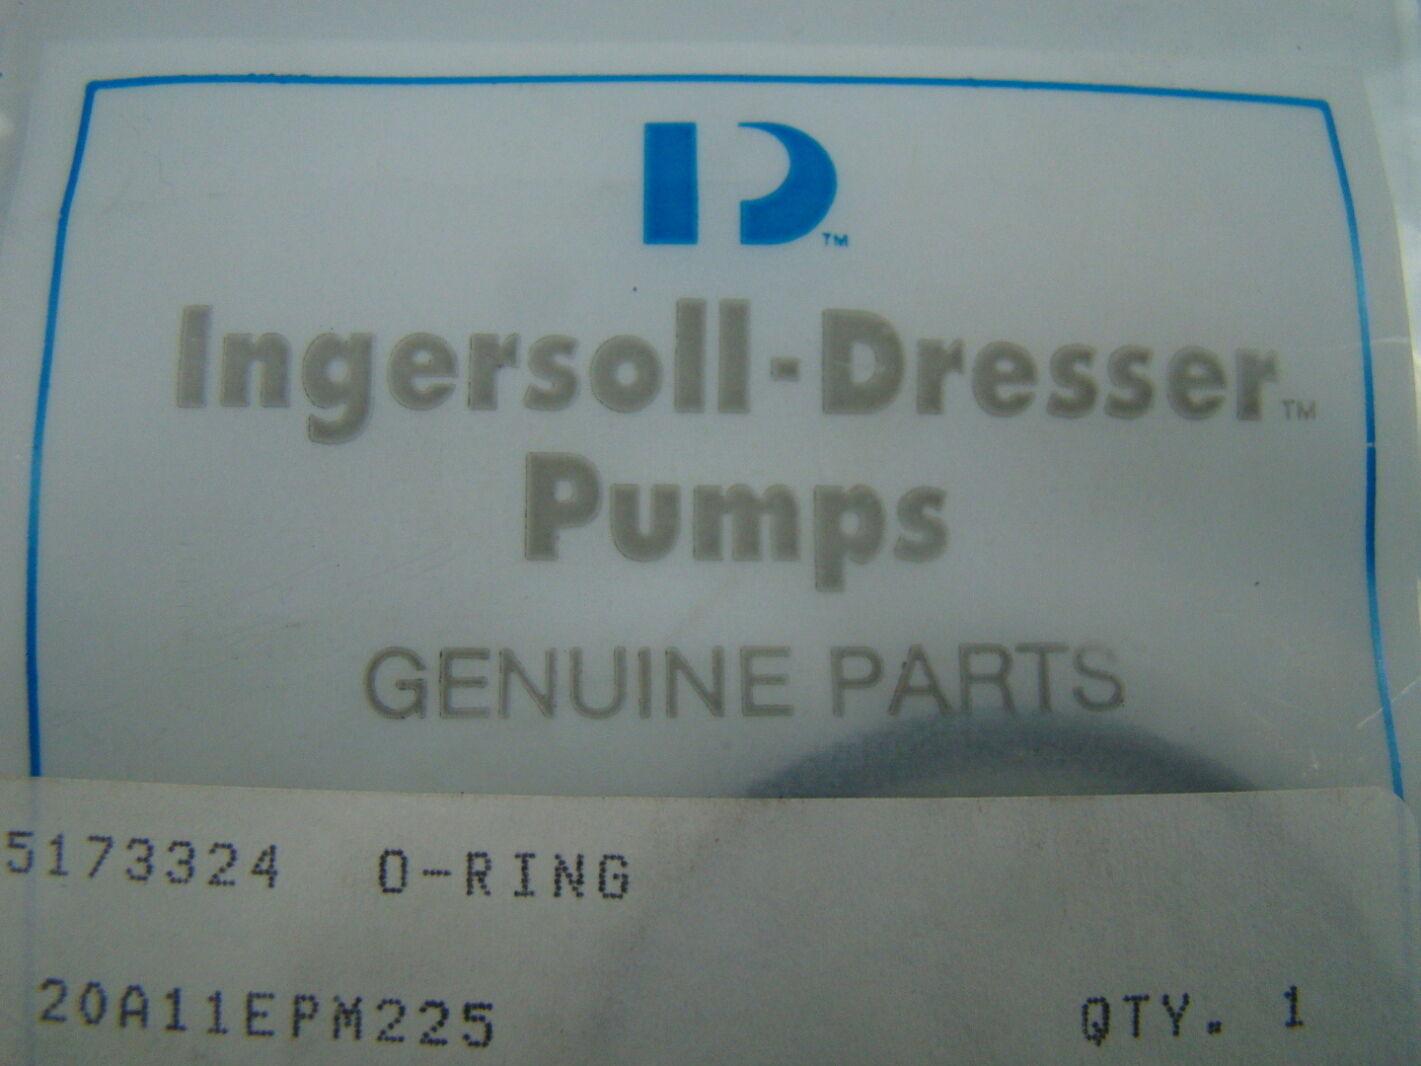 Ingersoll-Dresser Pumps 95173324 O-Ring 20A11EPM225